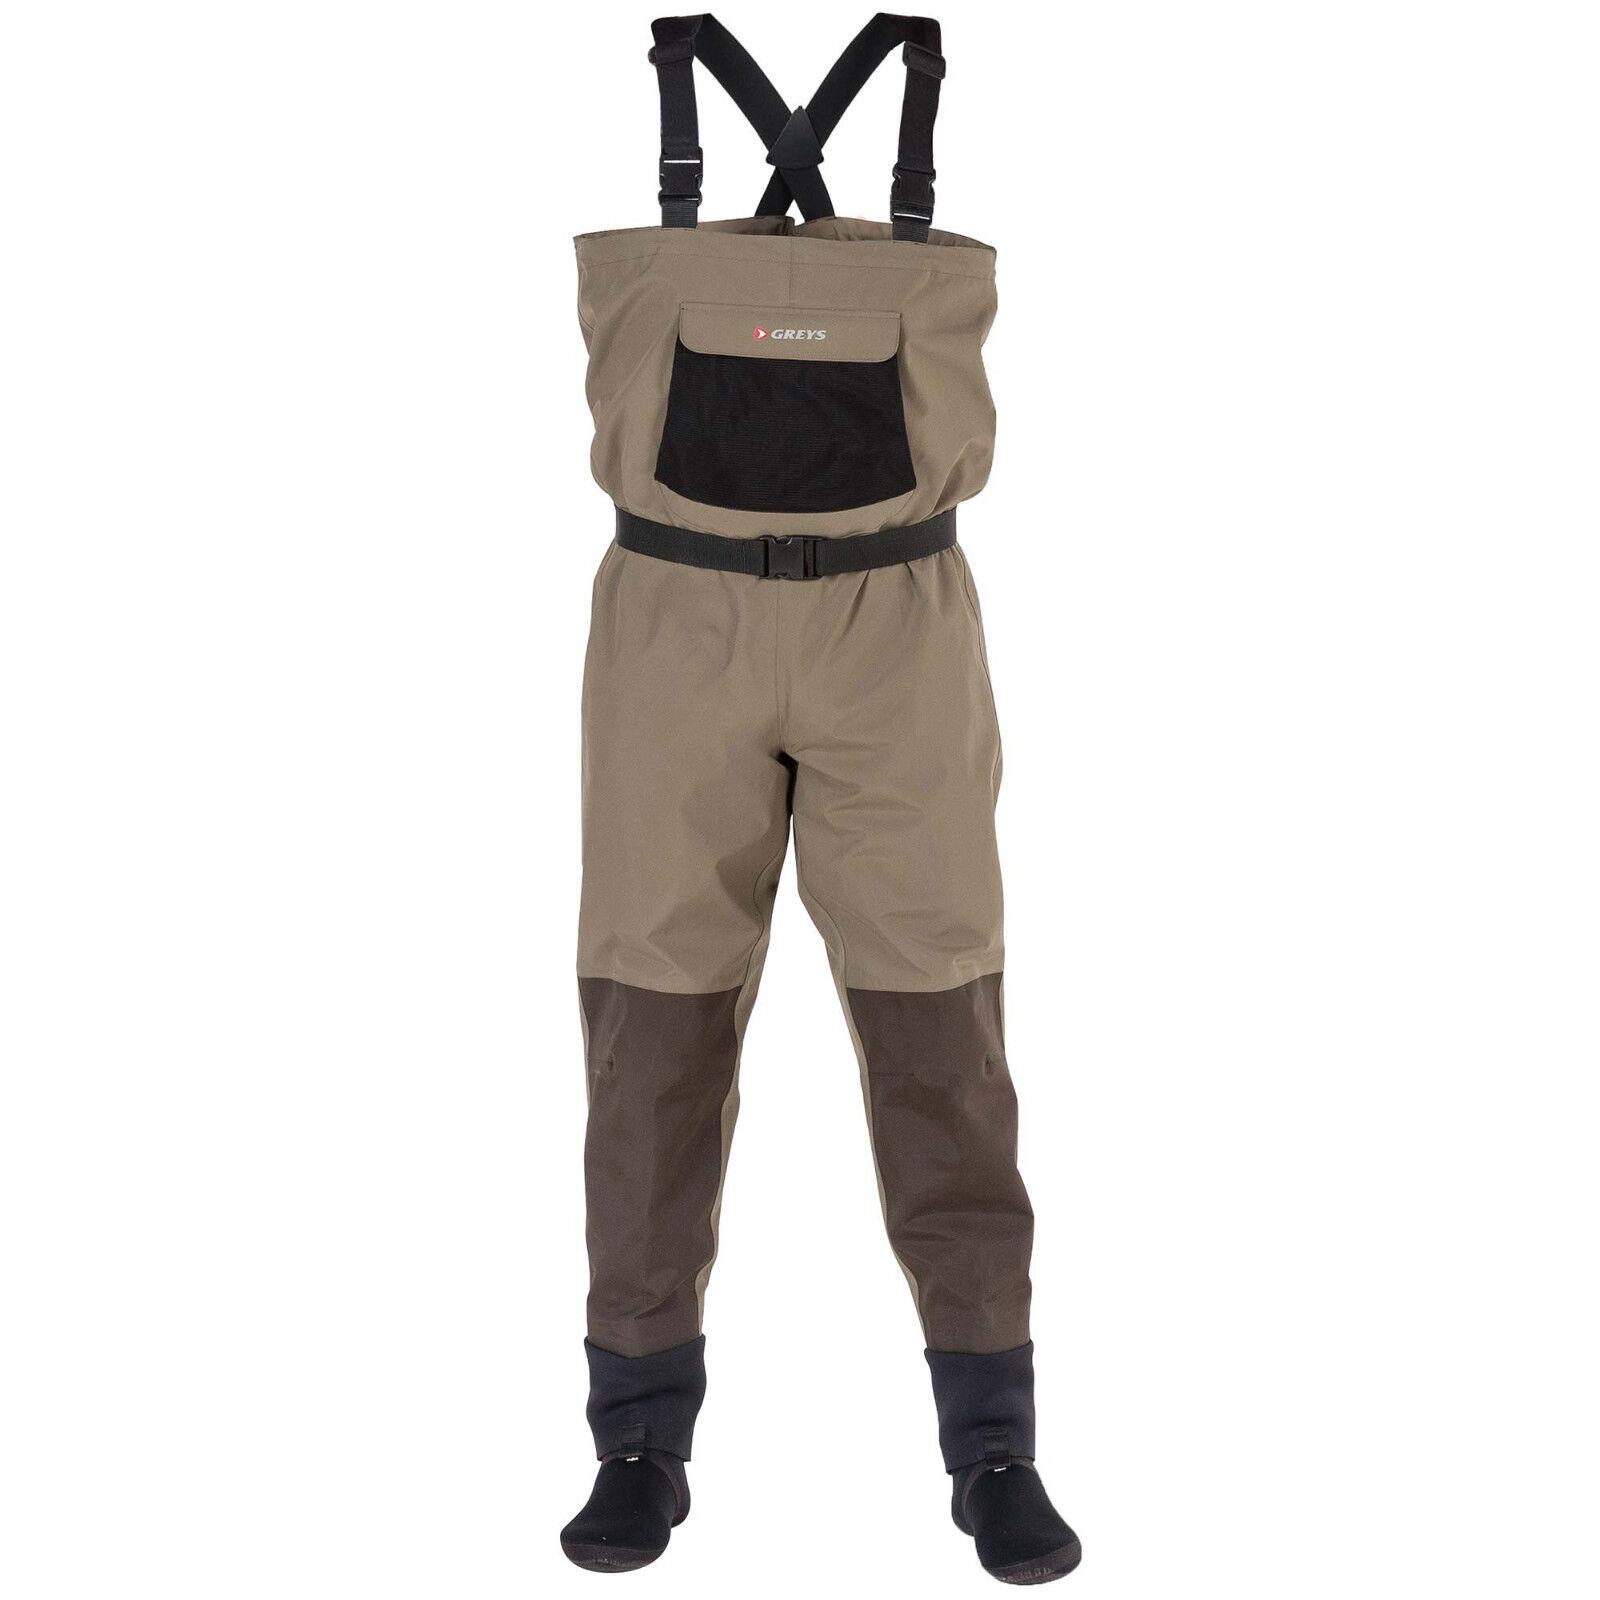 grigios STRATA CTX Impermeabili TRASPIRANTE CON füßlingen Watt Pantaloni Wat Pantaloni Pantaloni Angel